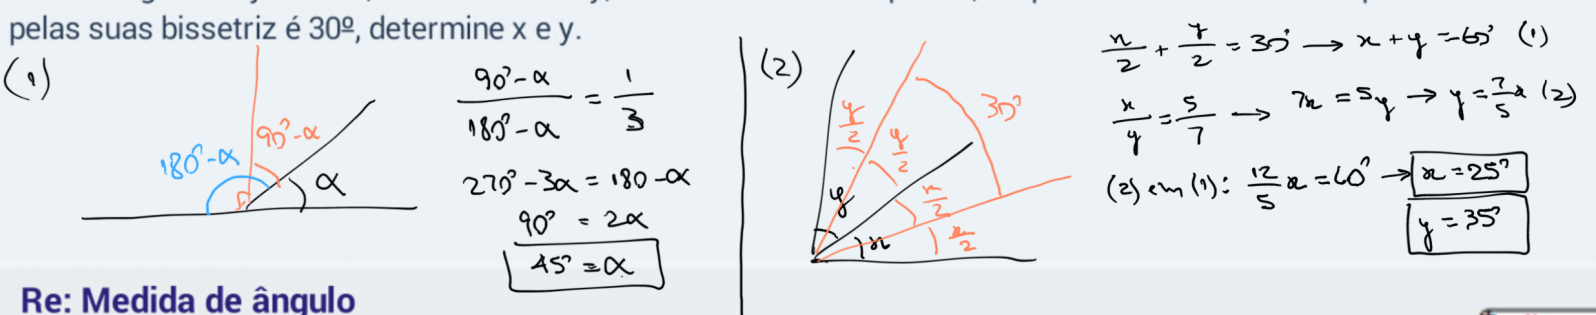 Medida de ângulo 2mfi6mq